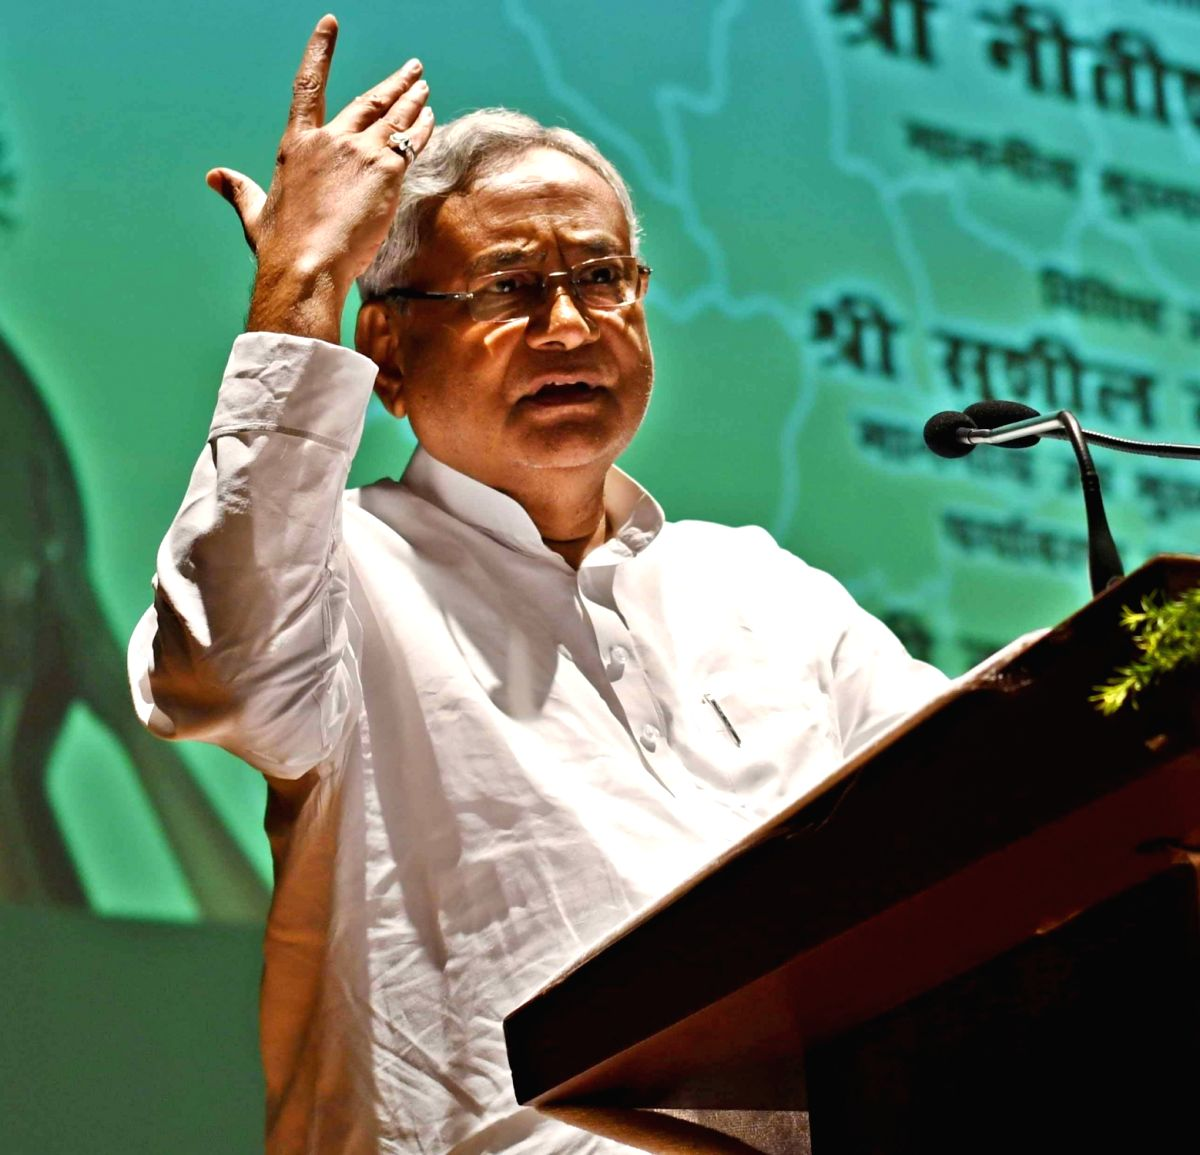 Bihar Chief Minister Nitish Kumar. (Image Source: IANS)